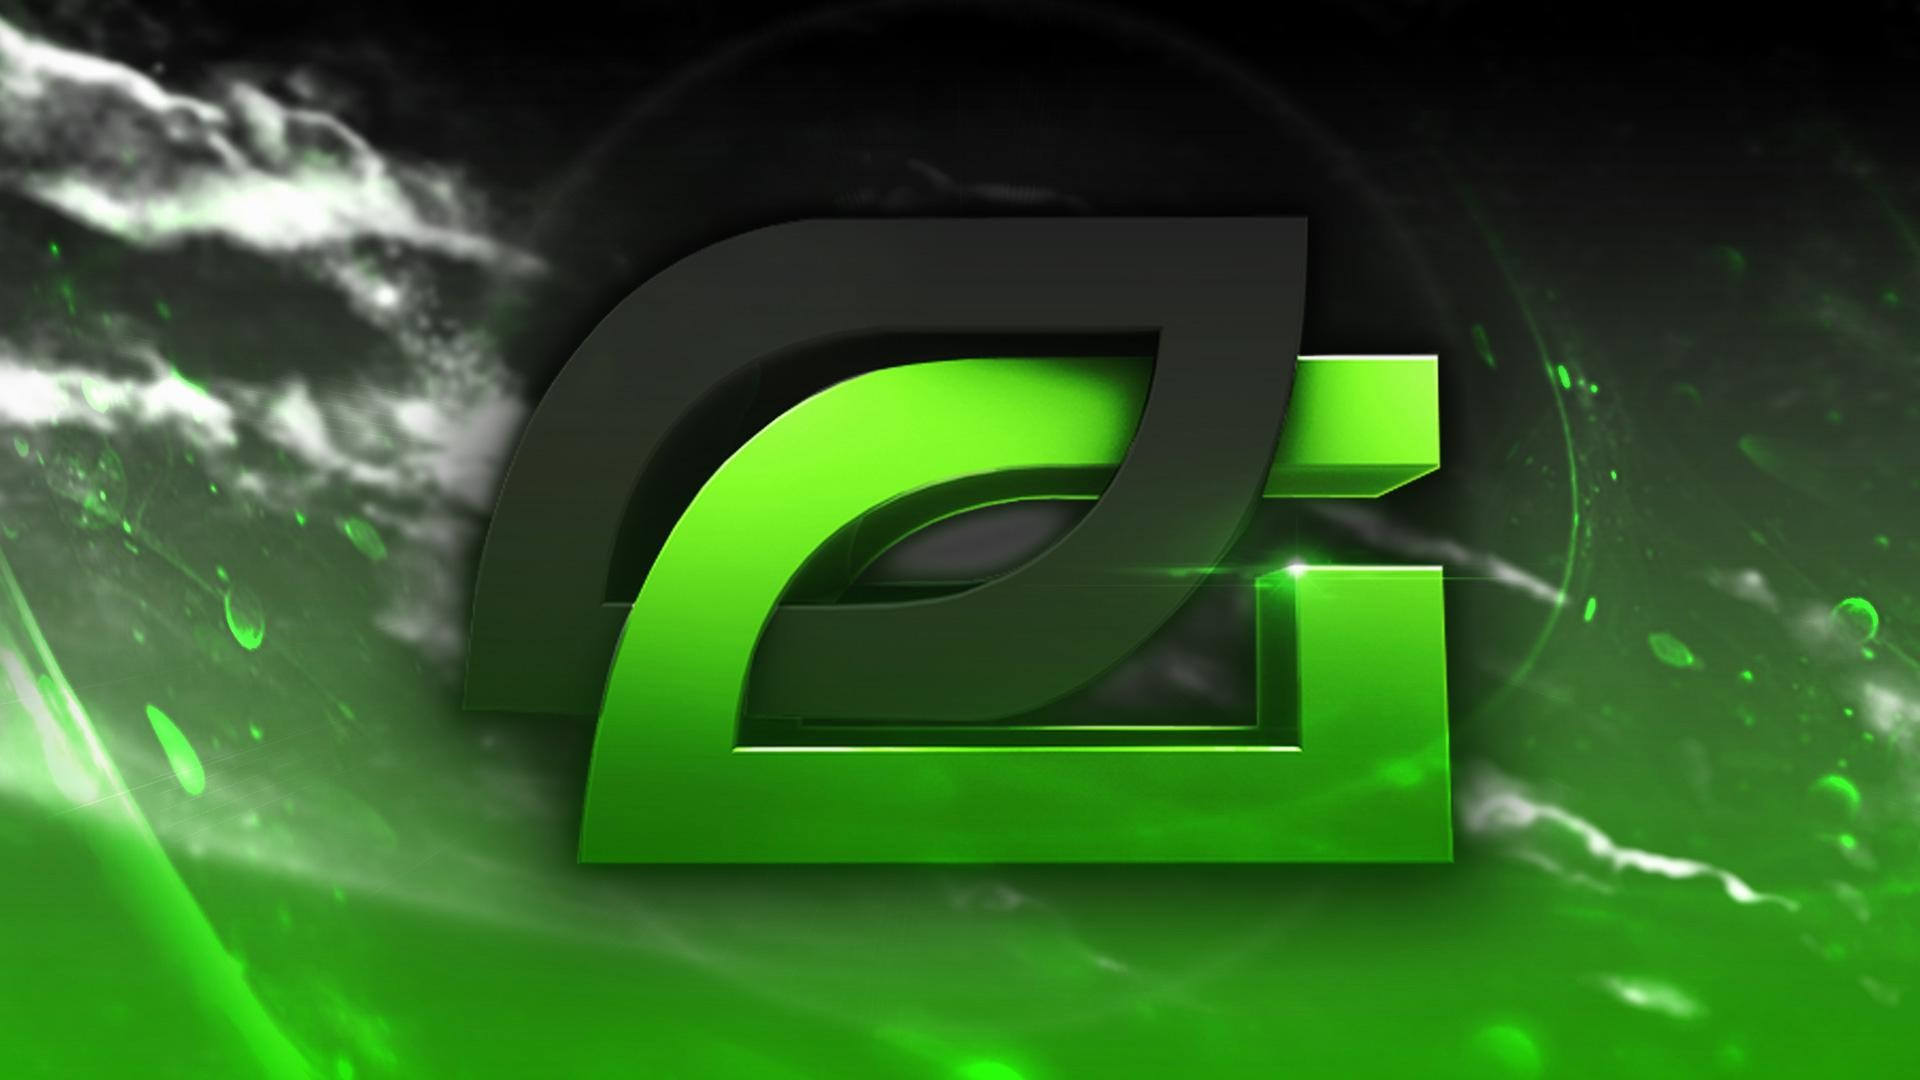 Optic-gaming-green-wall-full-hd-wallpaper